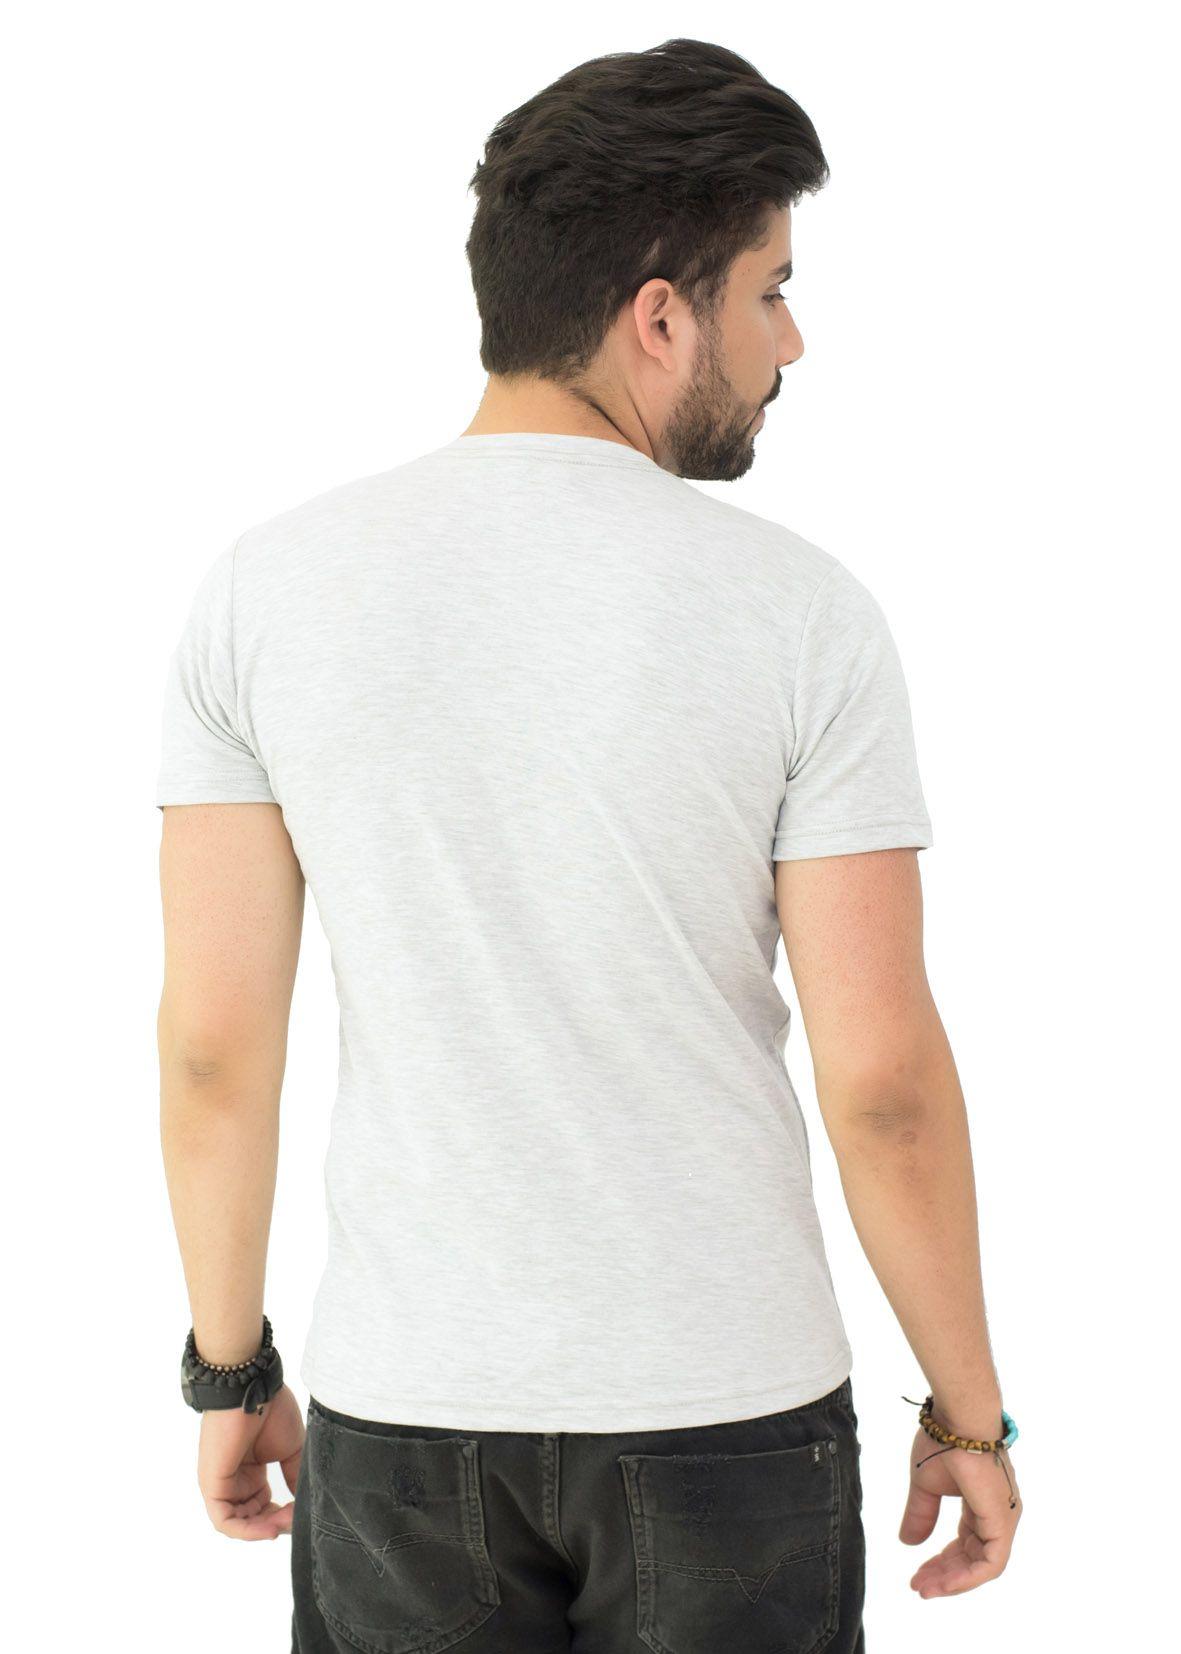 Camiseta Basic Brb Mescla Claro SLIM FIT  - Ca Brasileira